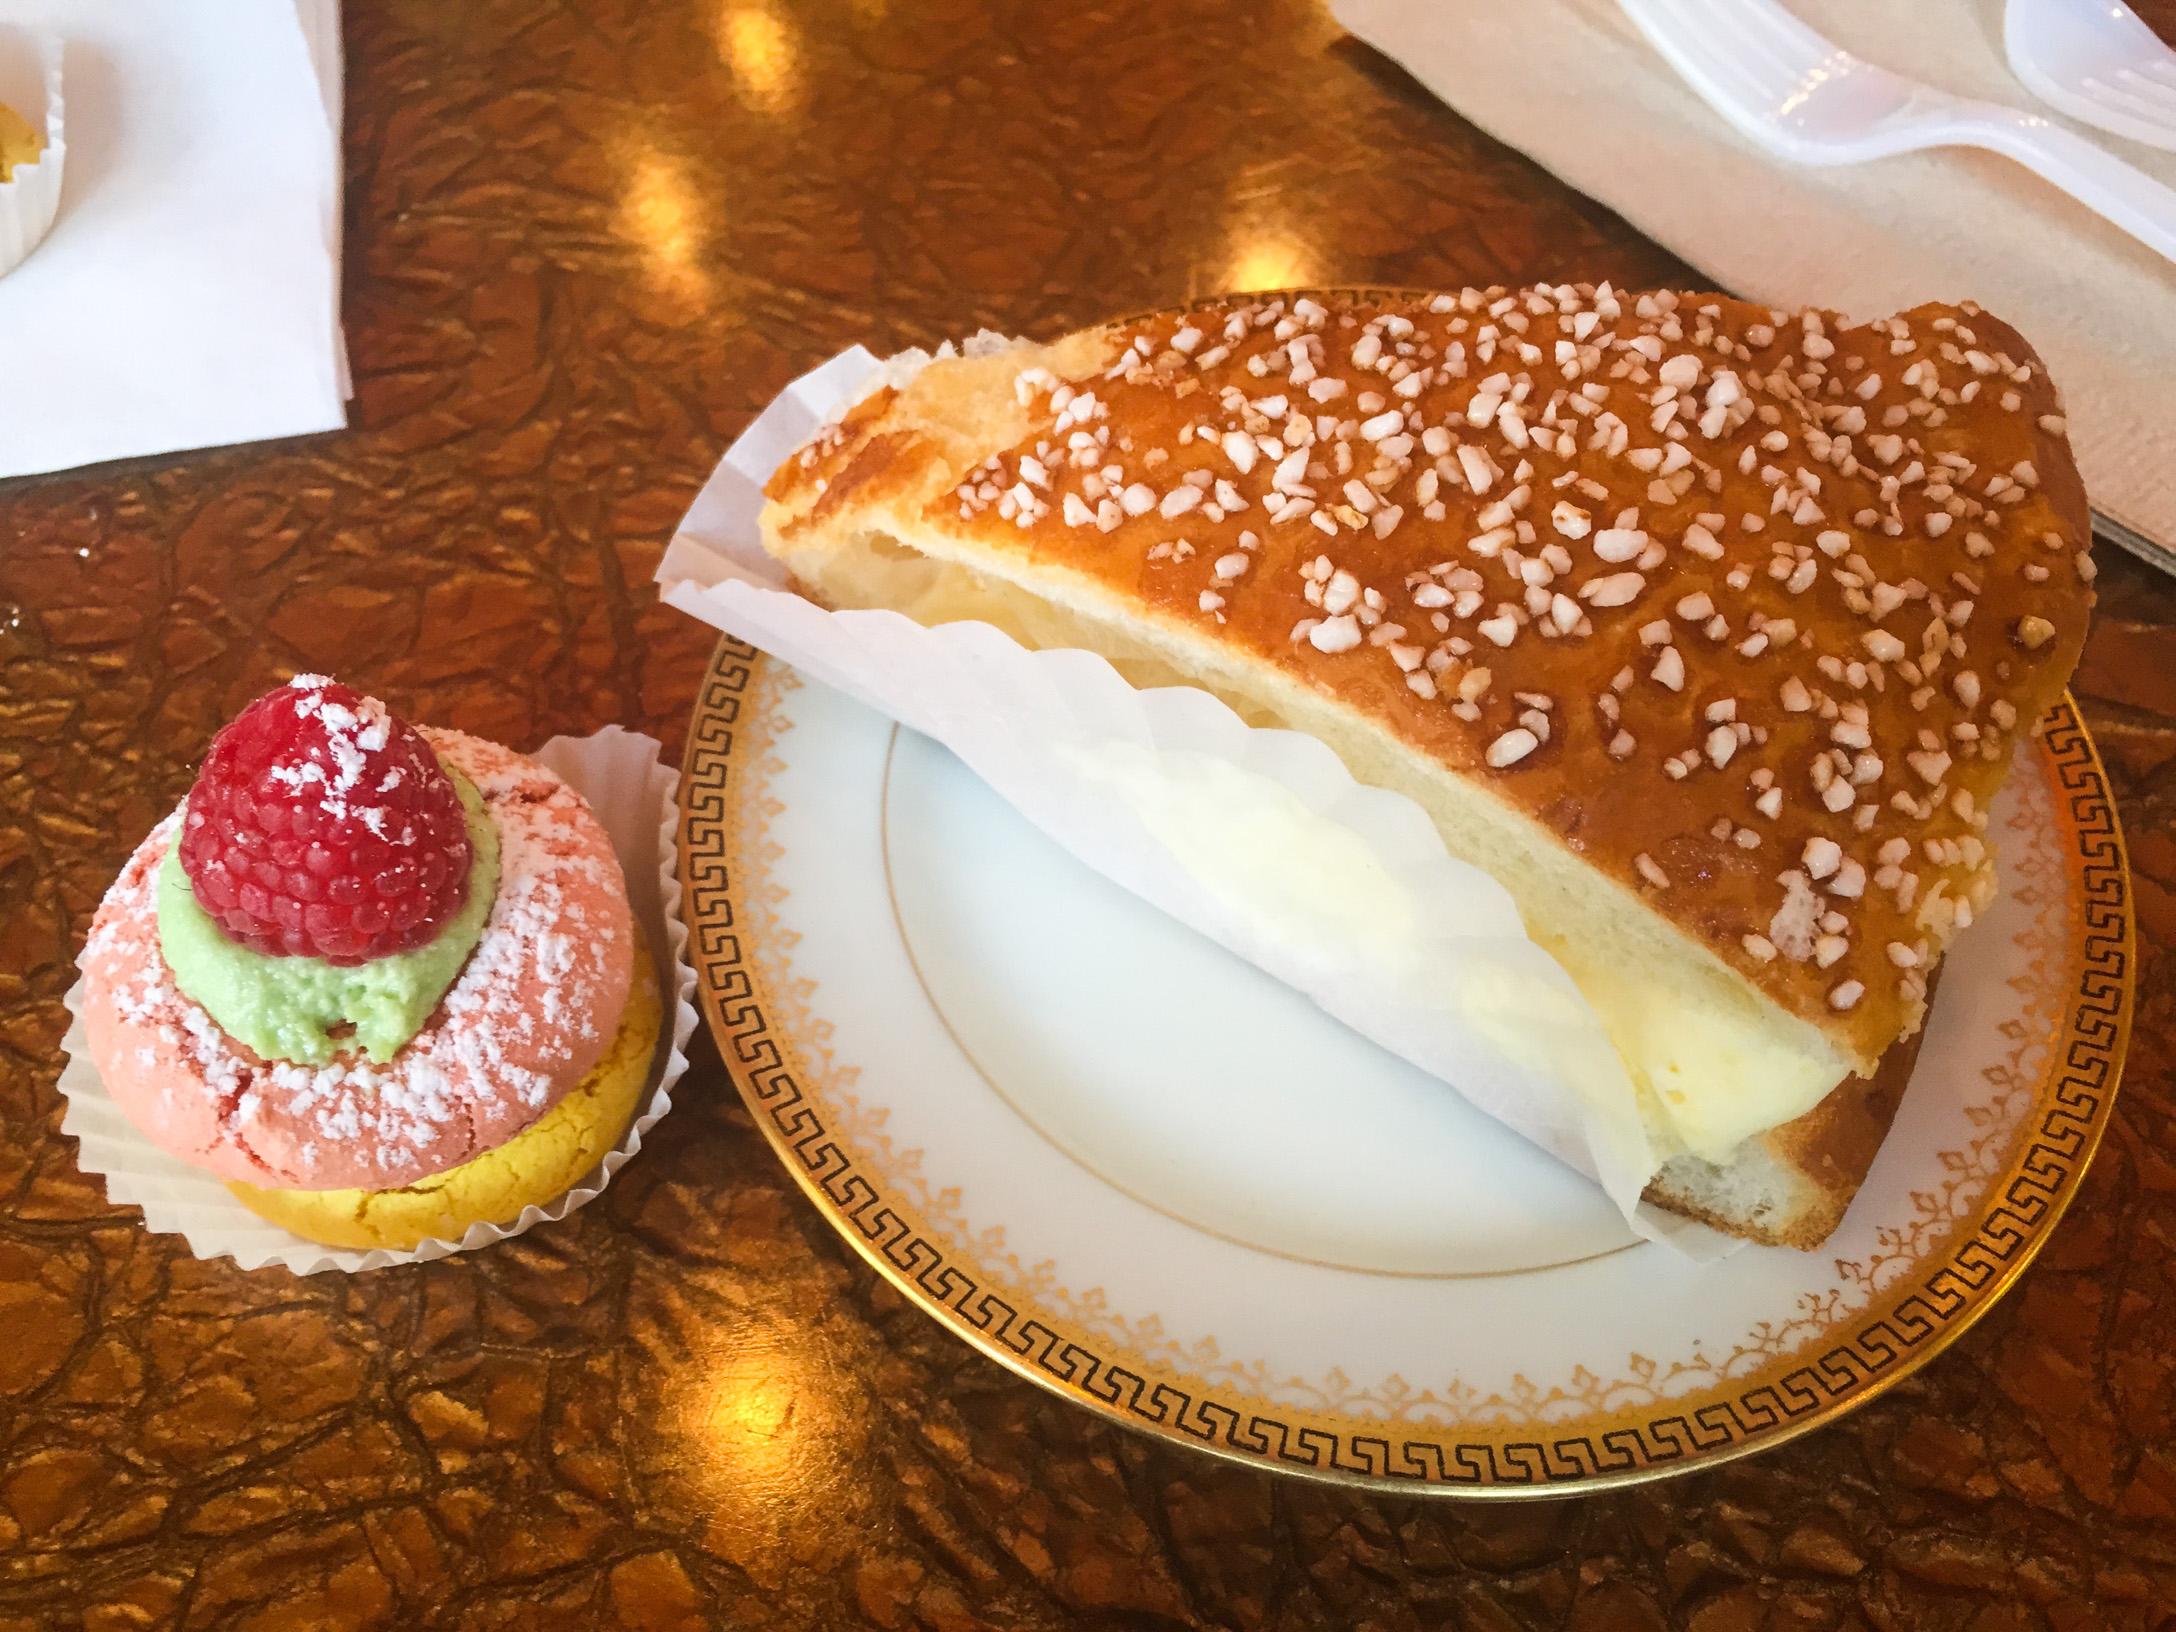 Raspberry-Pistachio Macaron and St. Tropez Cake